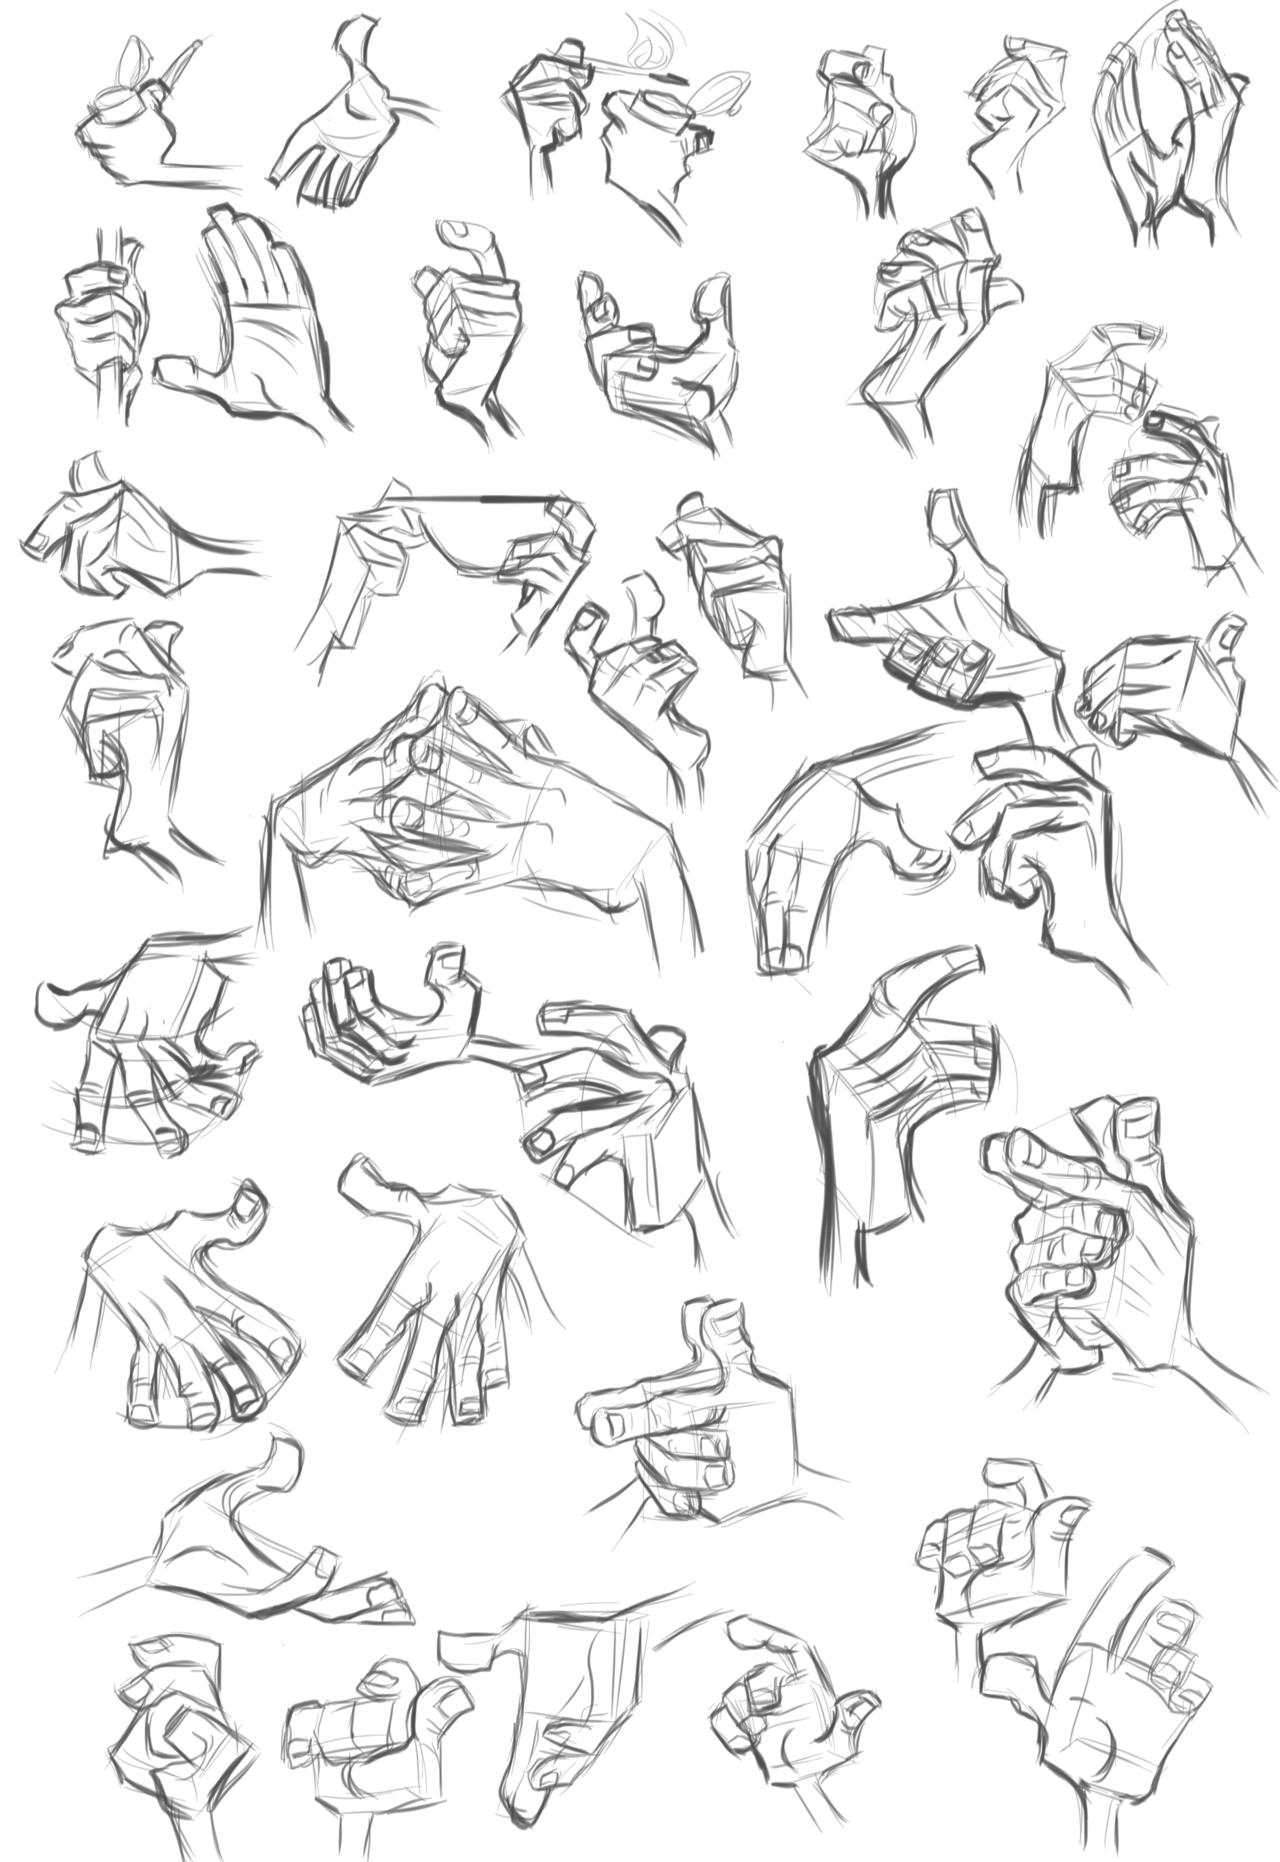 Pin de Xavier Bonet en Drawing | Pinterest | Anatomía, Dibujo y Dibujar